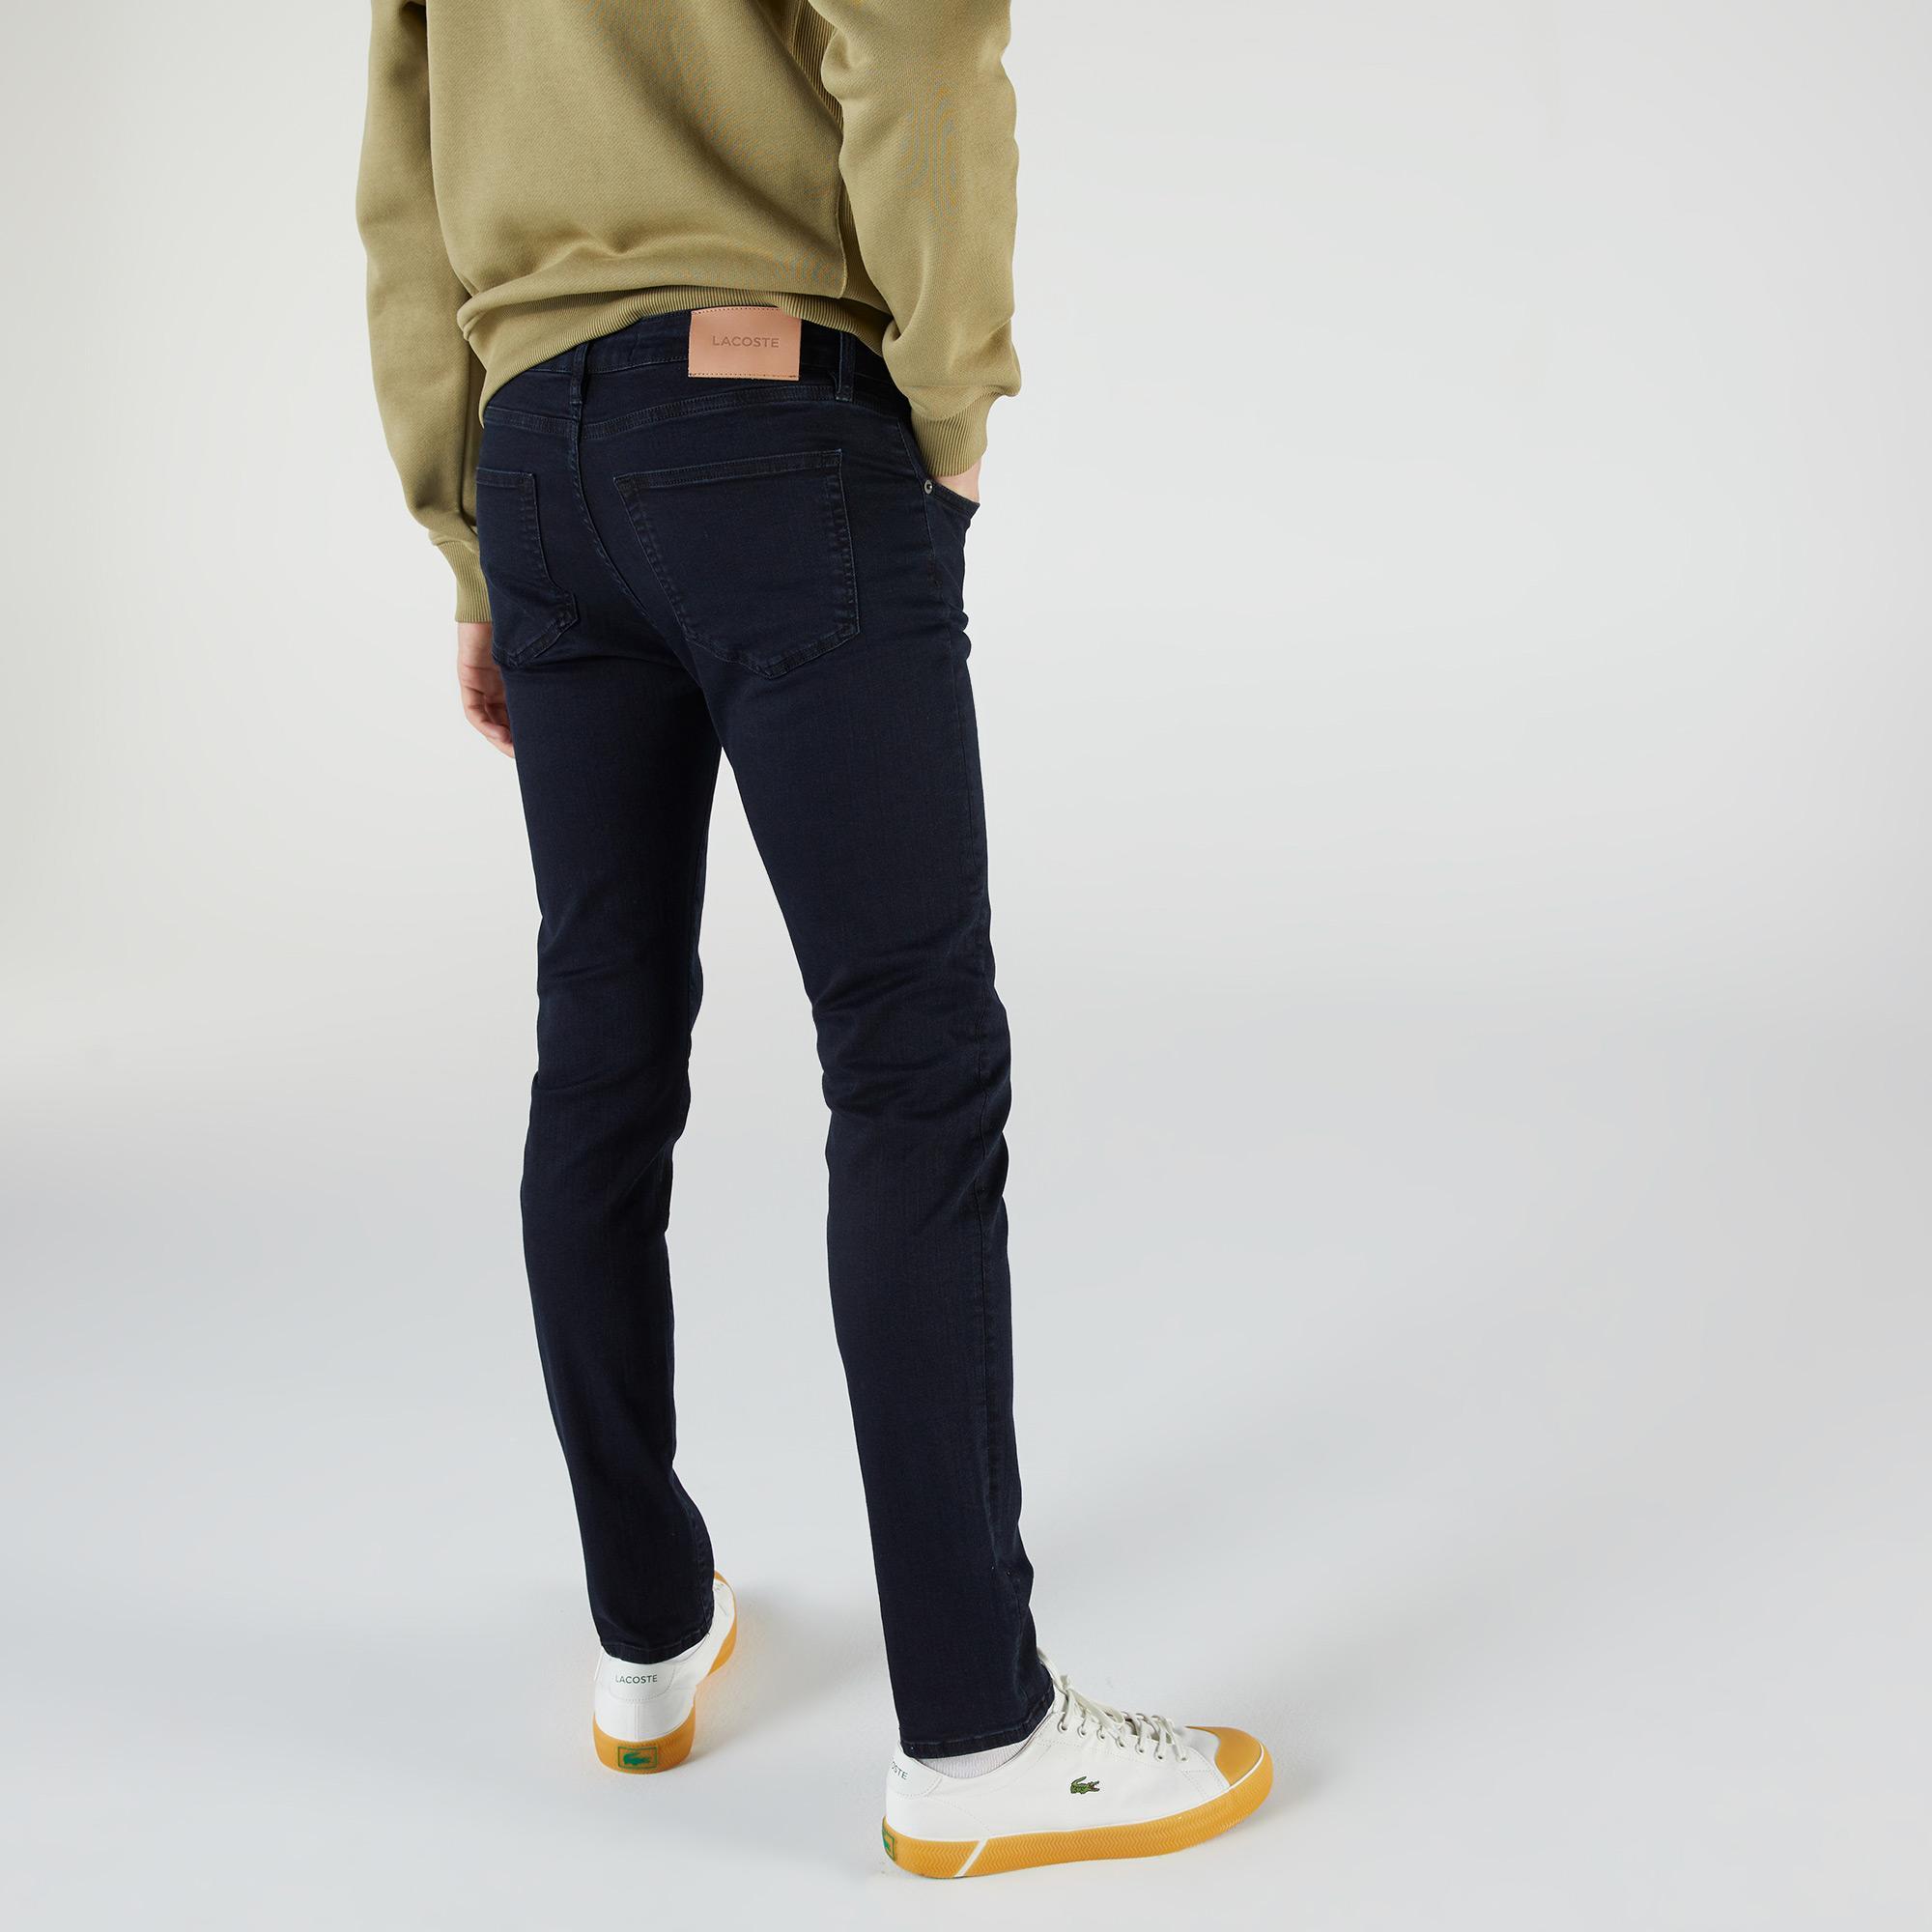 Lacoste Erkek Slim Fit İndigo Denim Pantolon